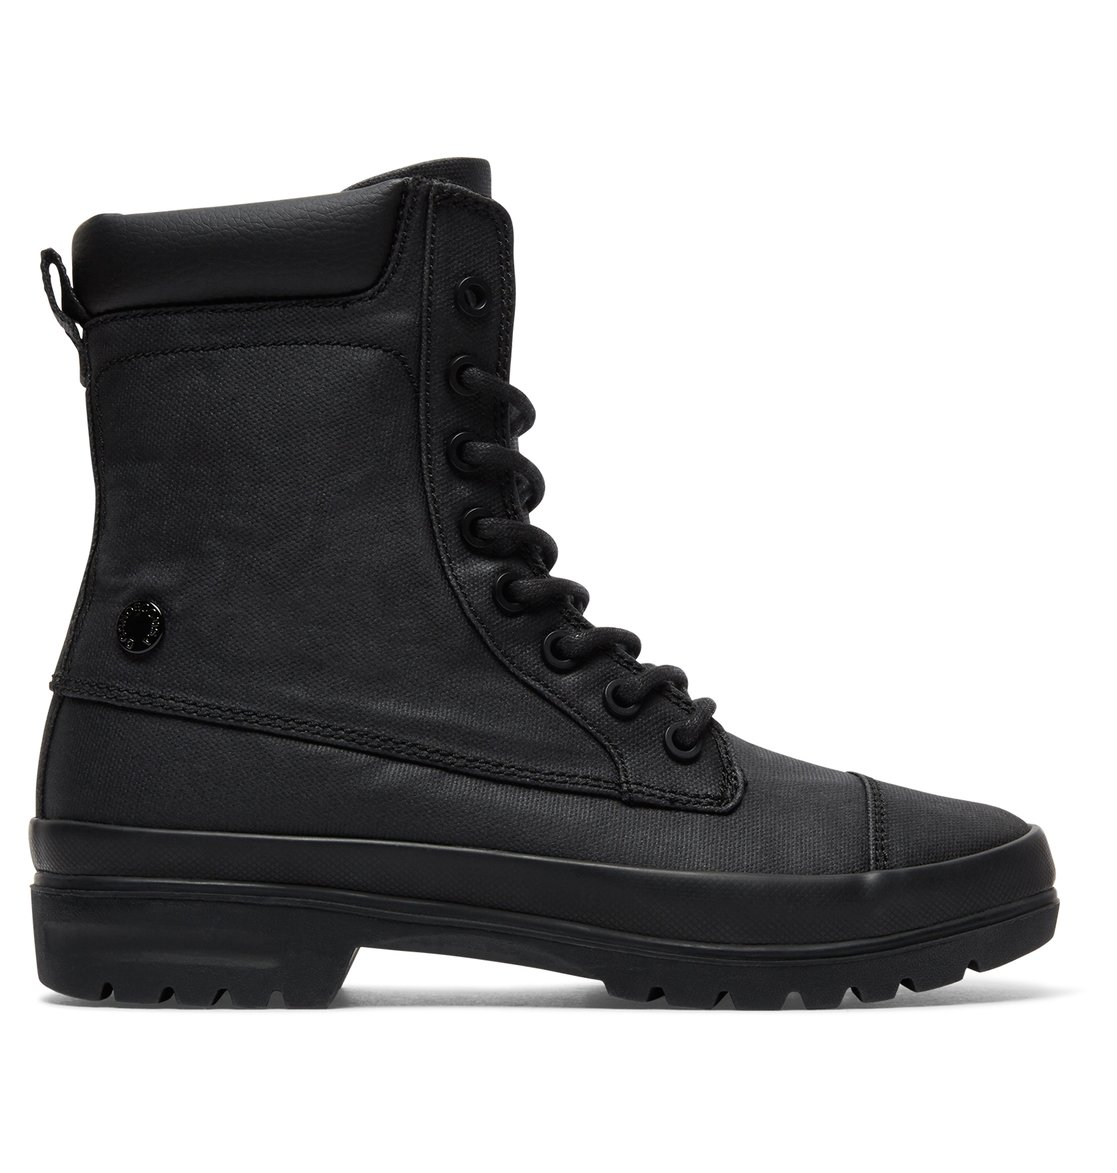 6daf5402349 0 Amnesti TX - Lace-Up Boots Black ADJB300009 DC Shoes